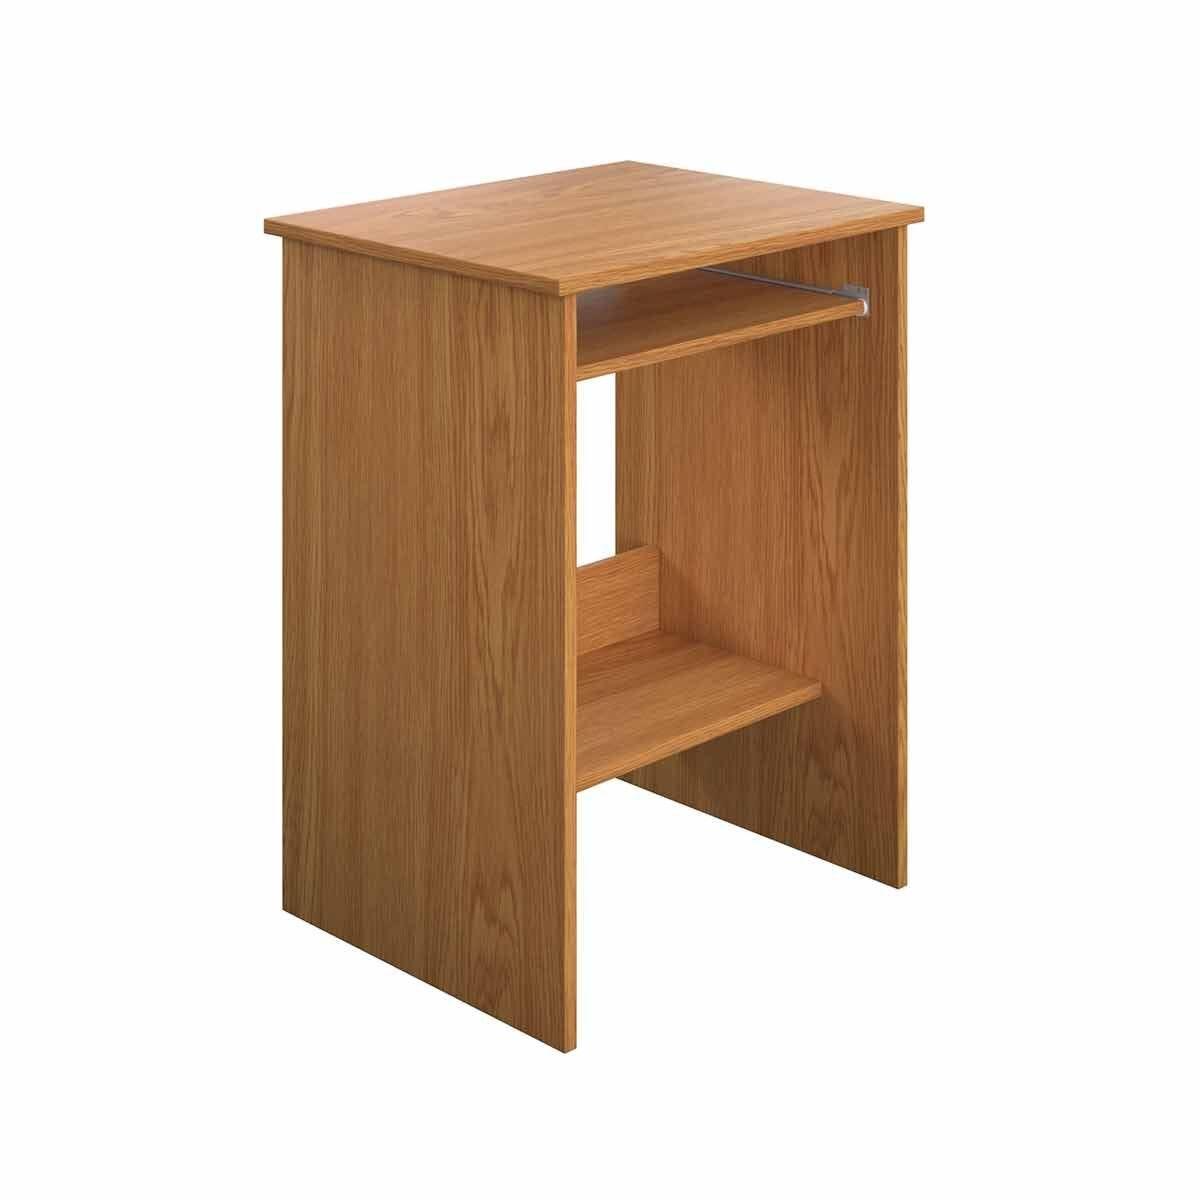 TC Office Eco Computer Stand 55cm Oak